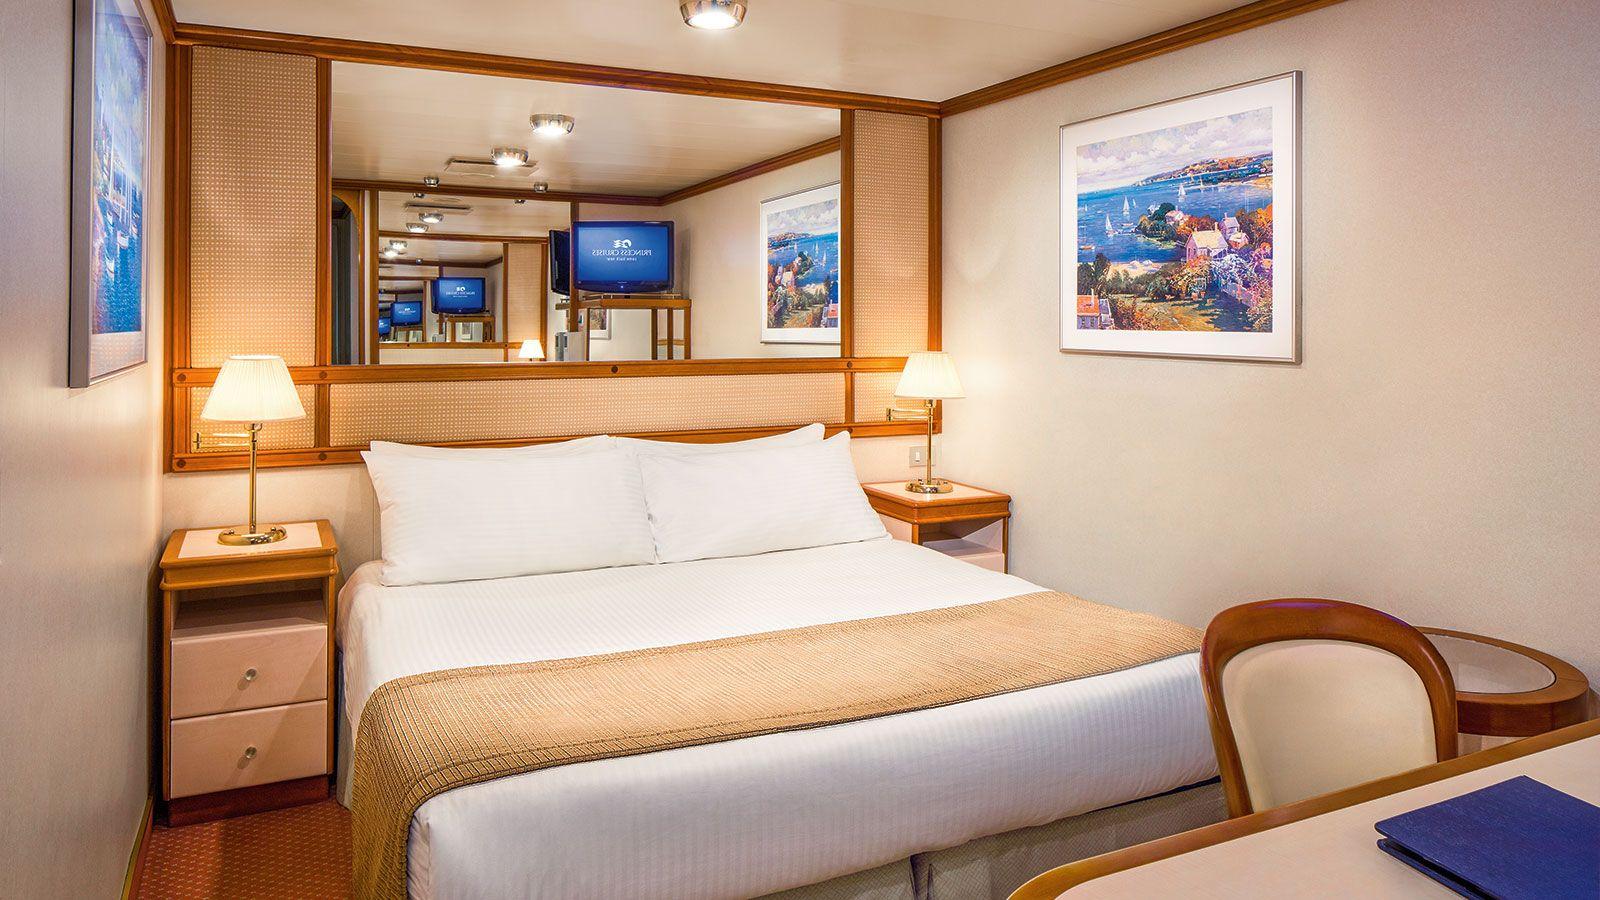 Japán - Hong Kong - Vietnam - Szingapúr szilveszteri hajóút kabinok